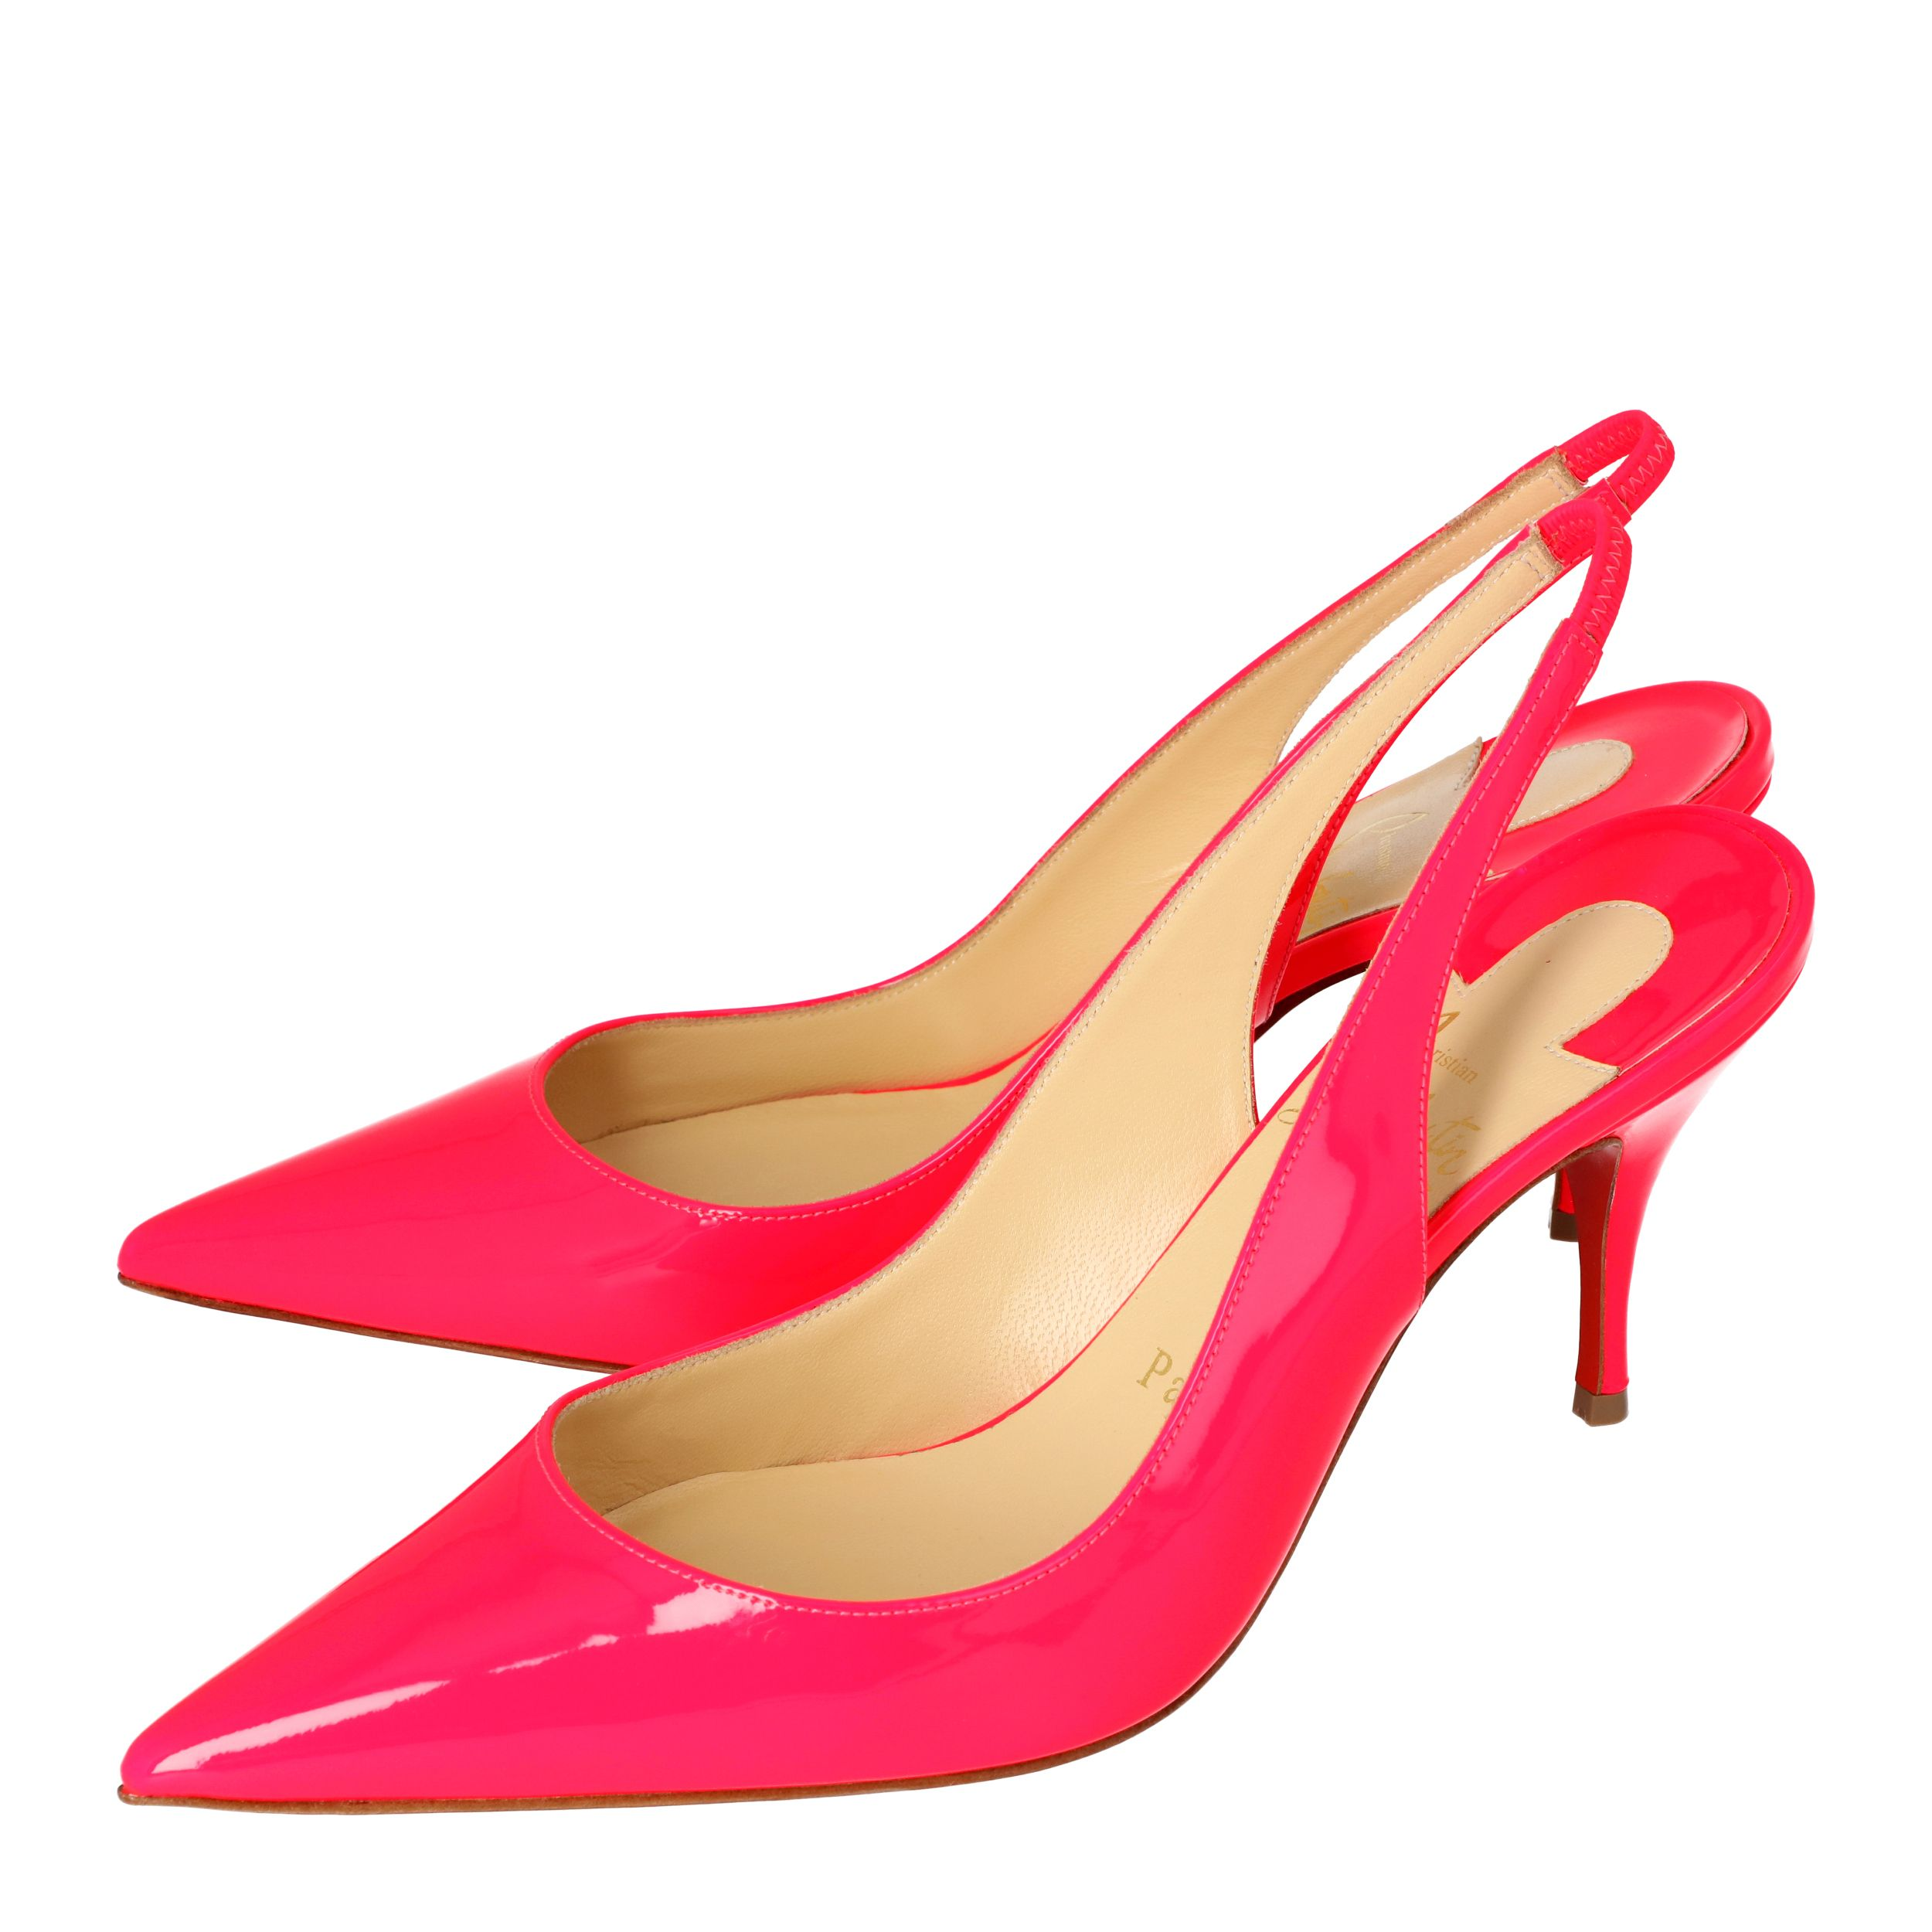 Christian Louboutin Pink Patent Leather